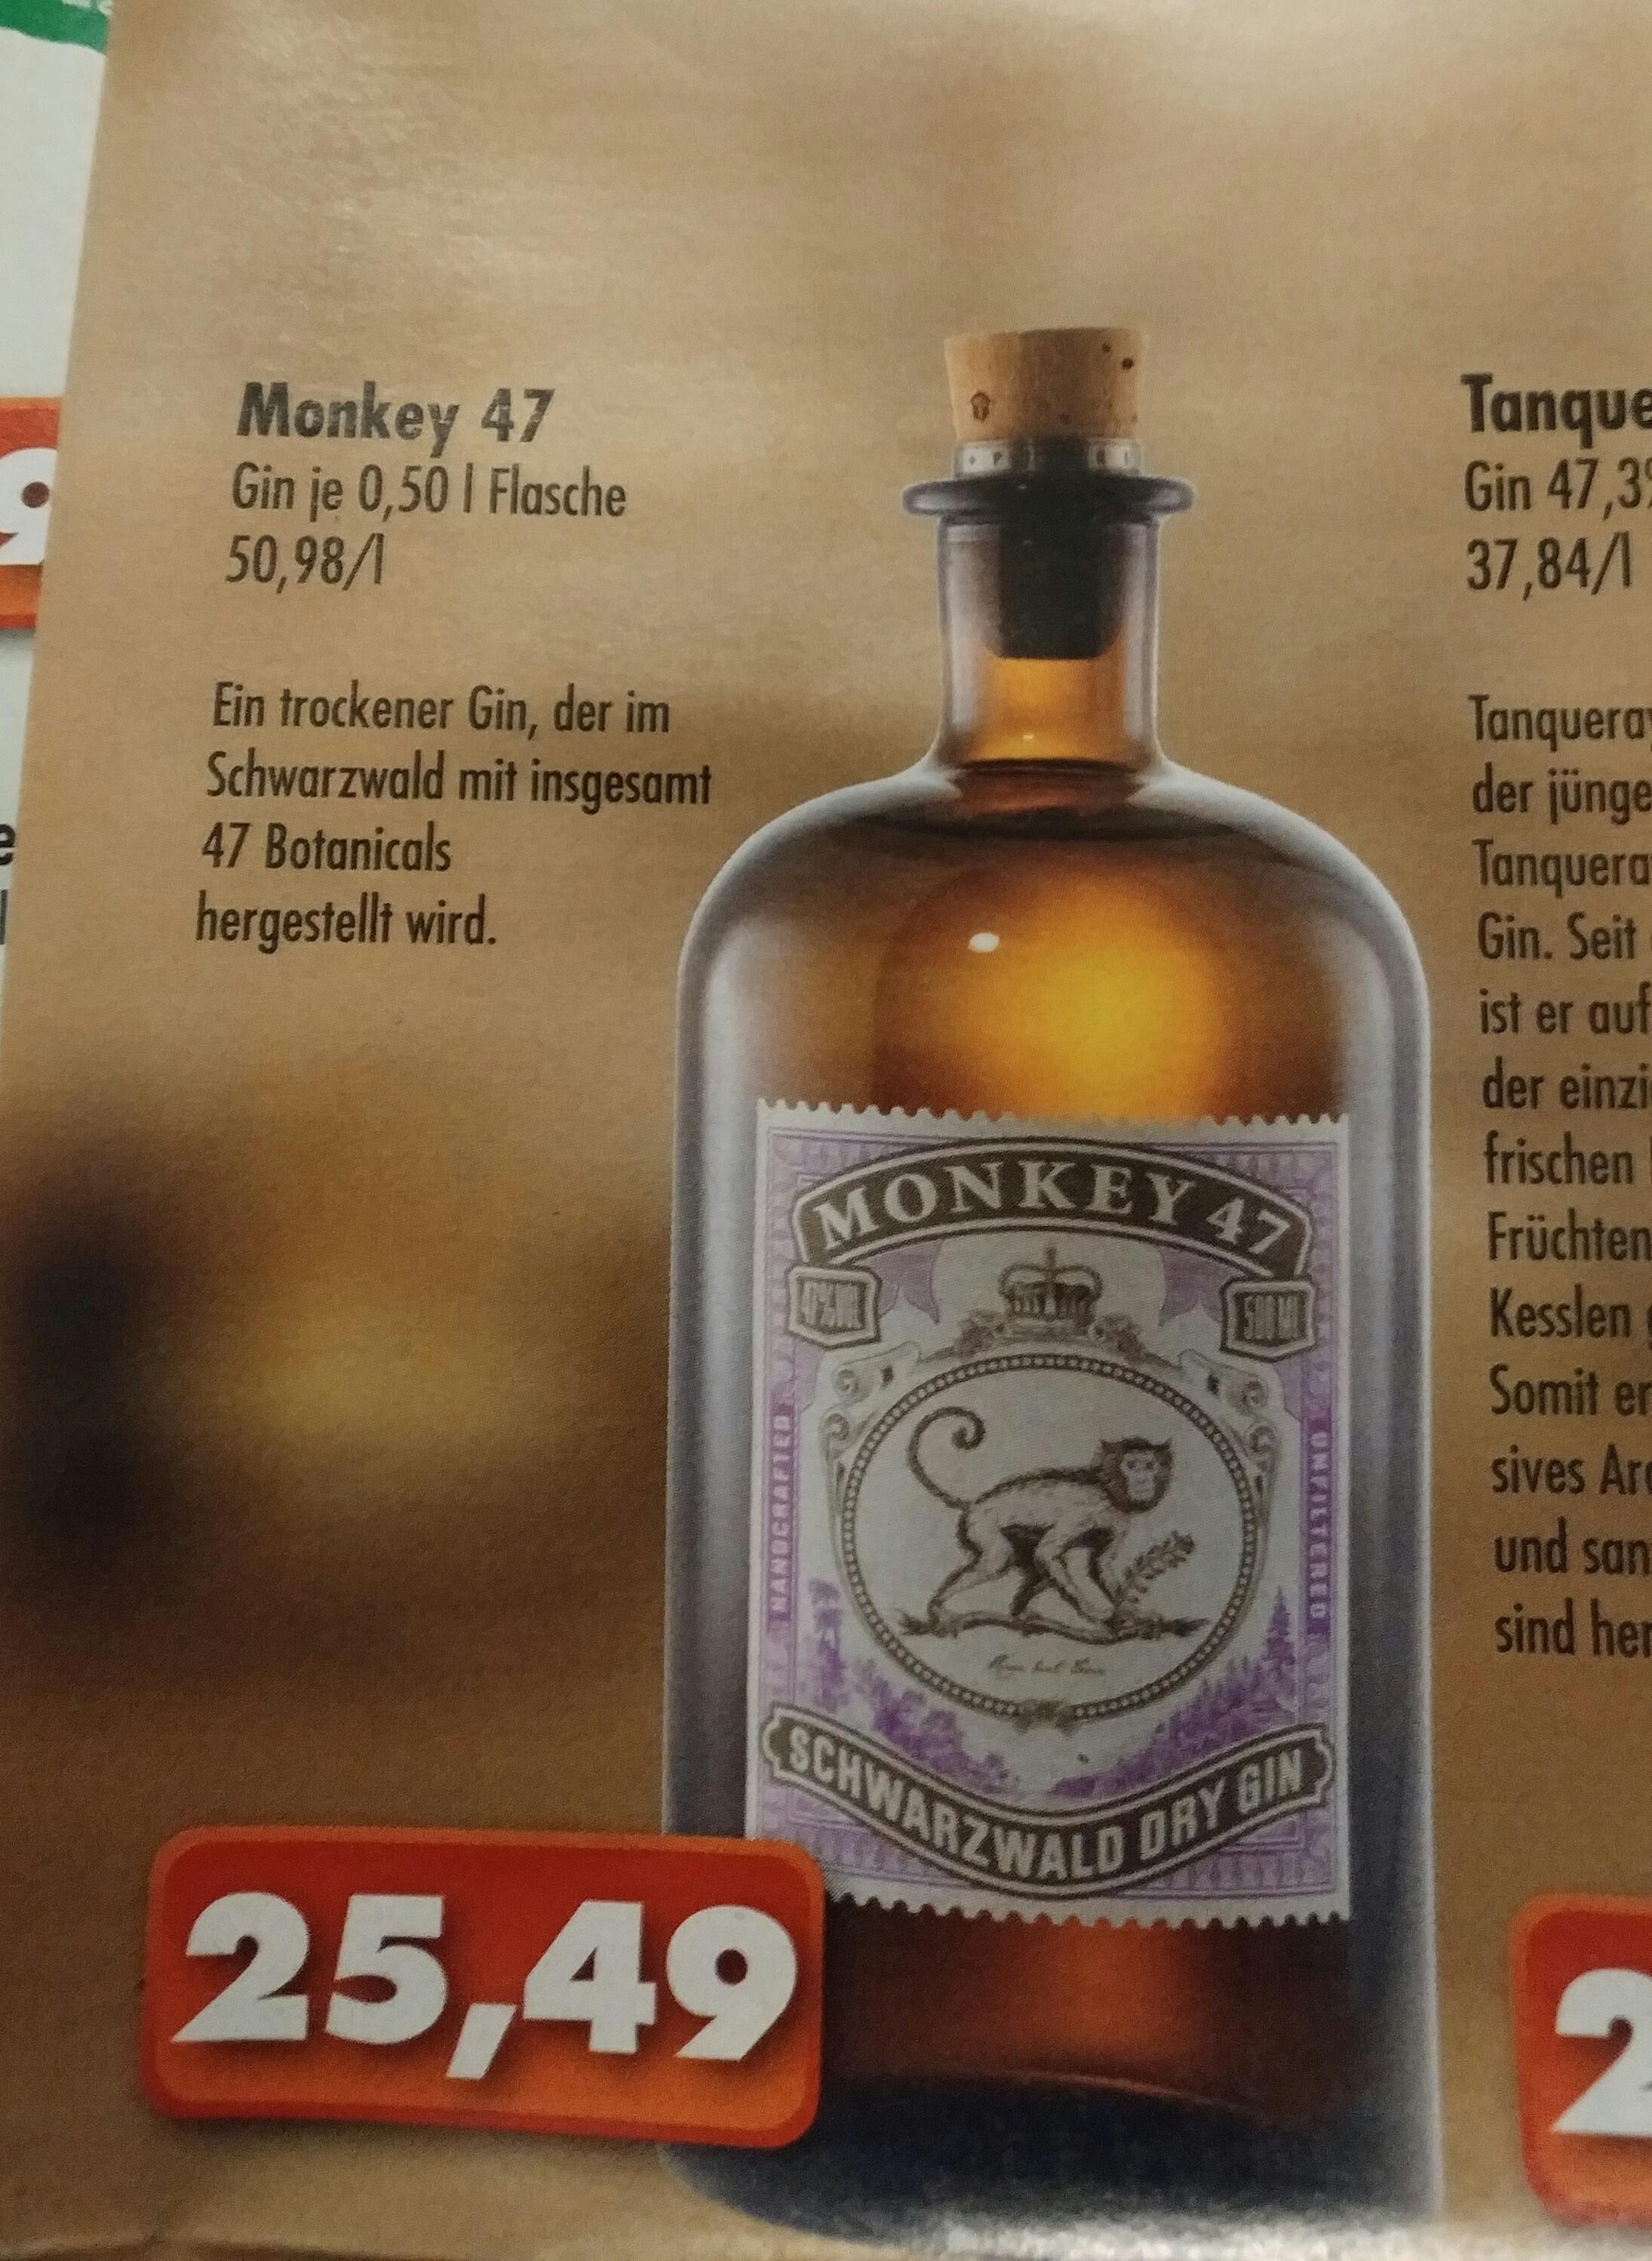 [Vollgut Lokal] Monkey 47 Gin 0,5 l